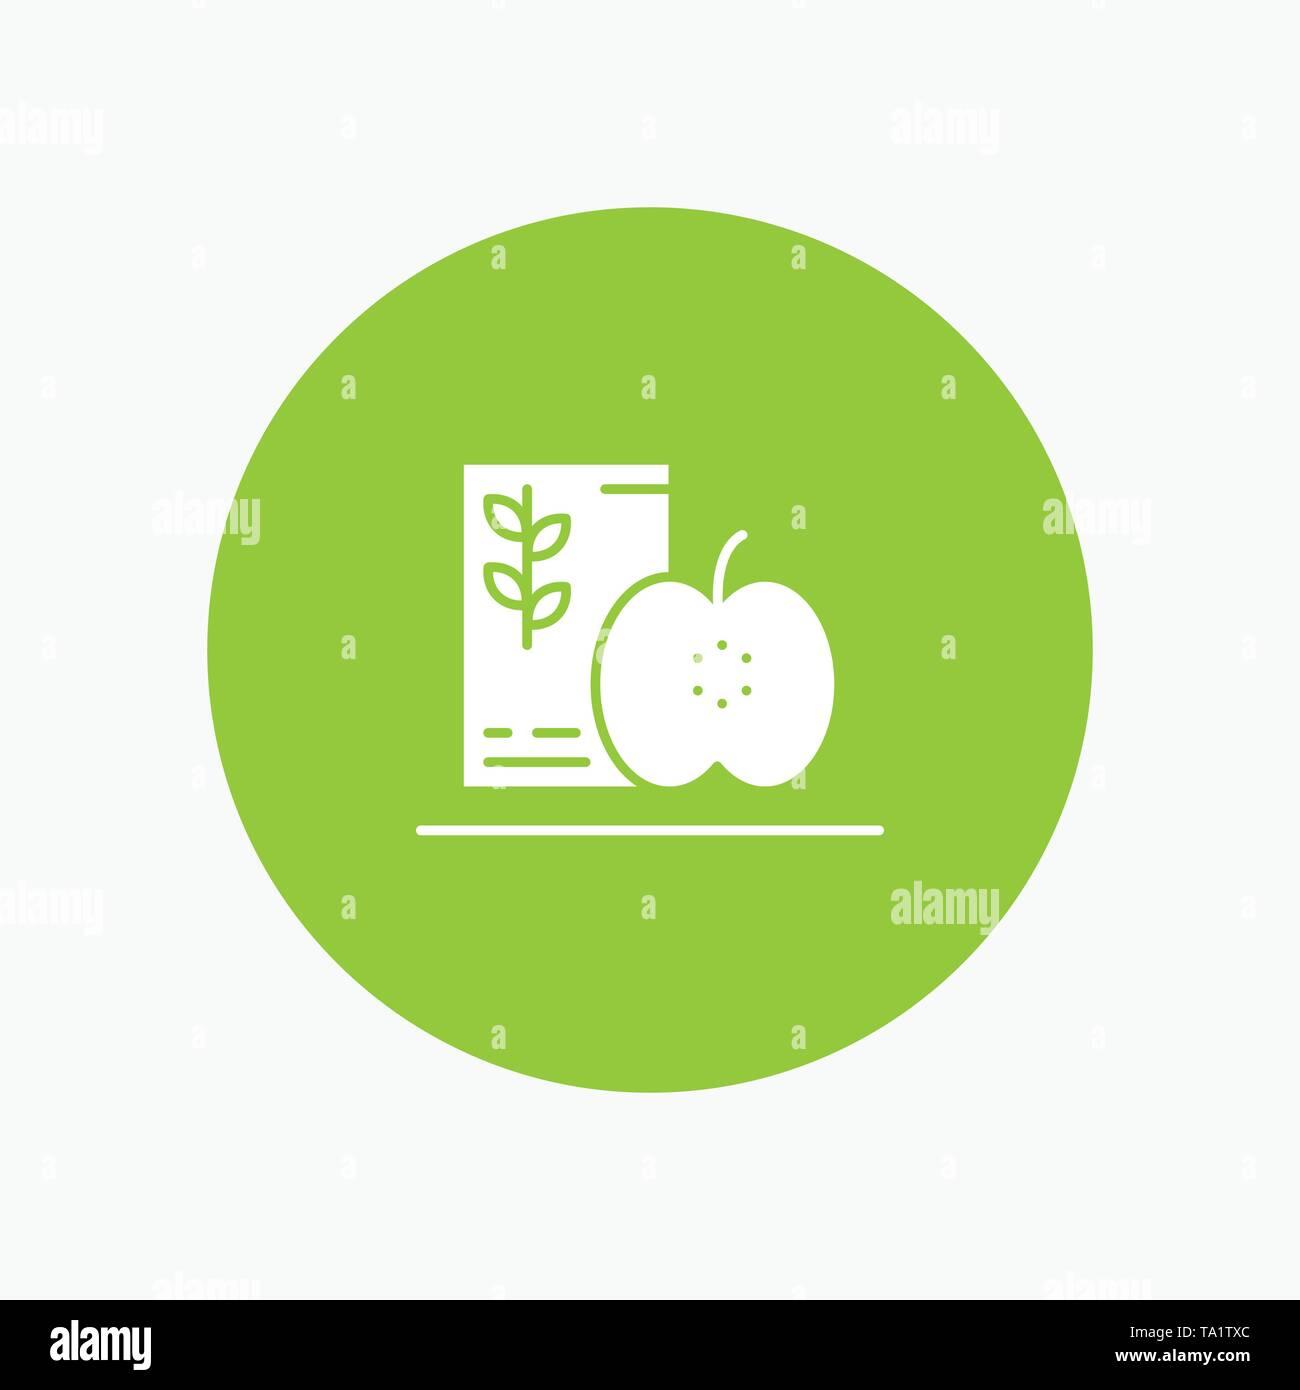 Breakfast, Diet, Food, Fruits, Healthy - Stock Image